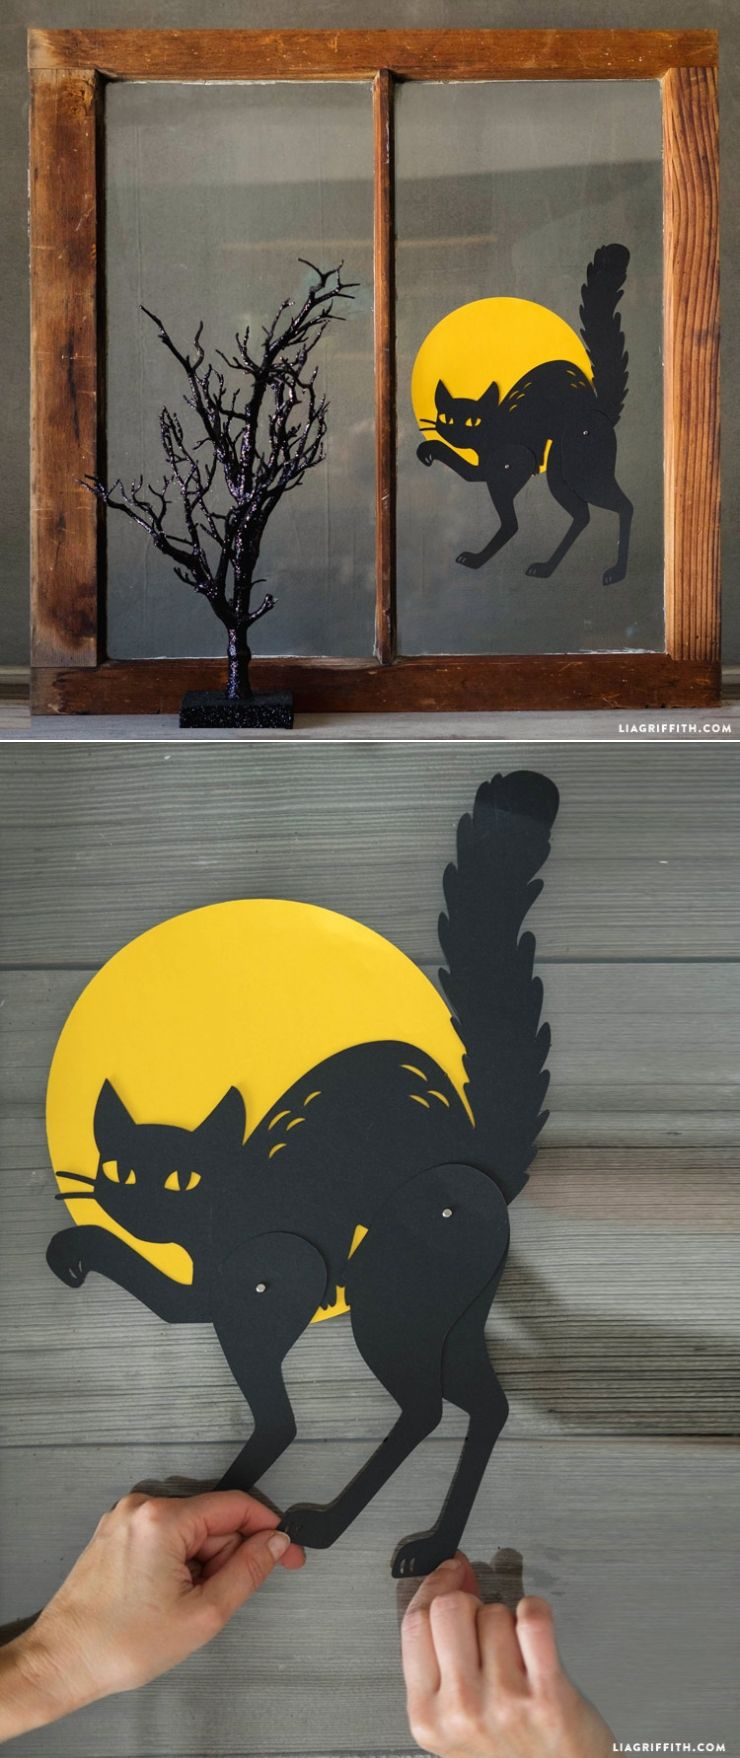 #Halloween #Papercut #PaperArt #DIYHalloween #Halloweendecorations www.LiaGriffith.com: